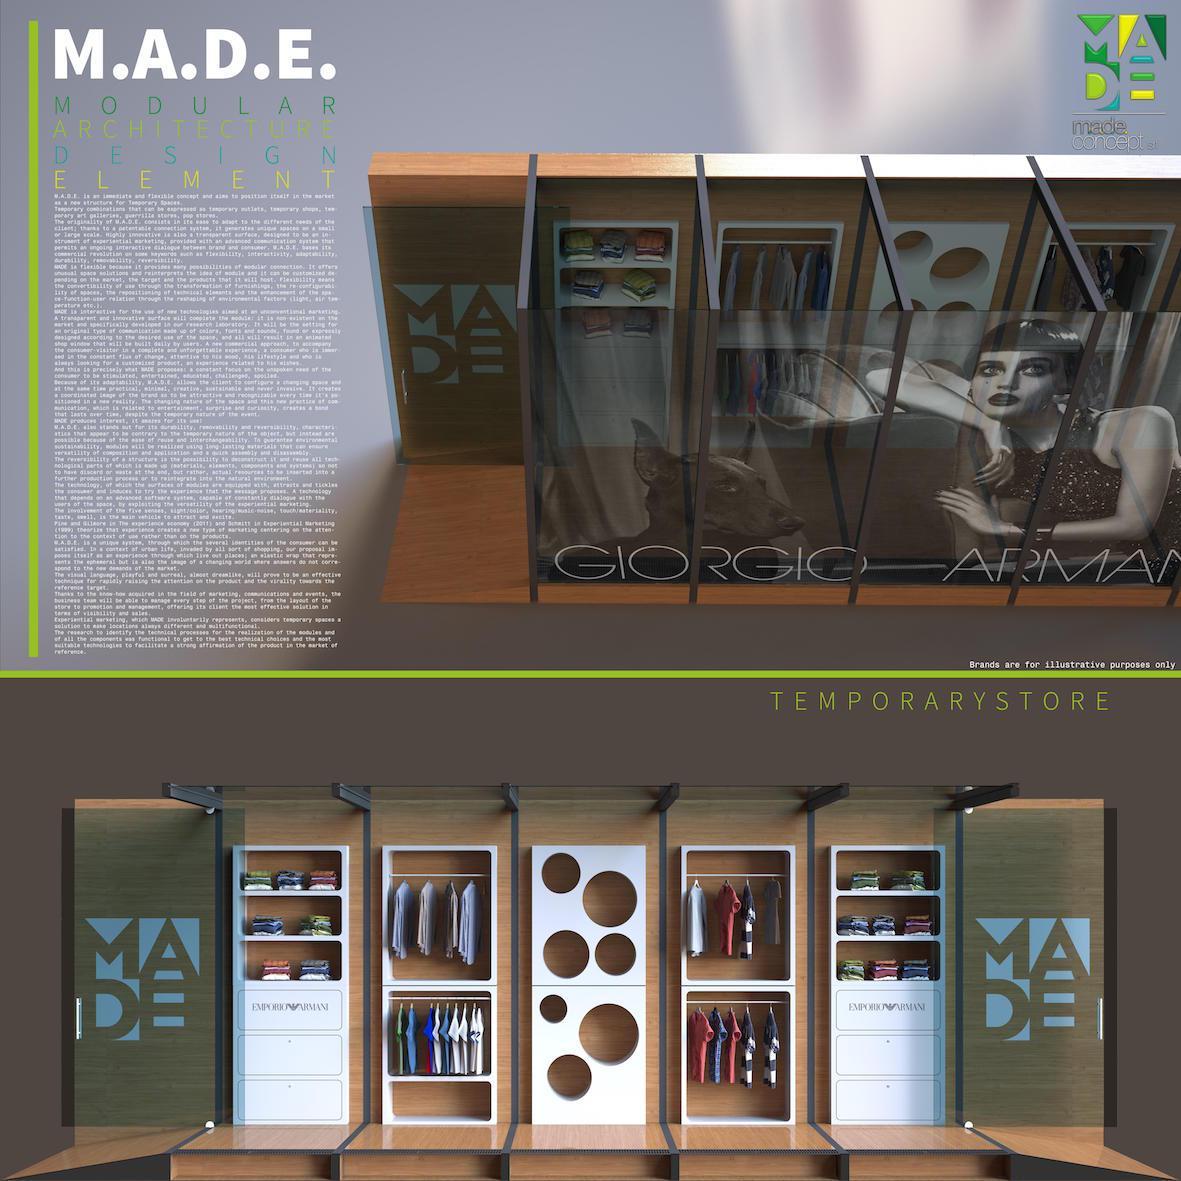 #1M.A.D.E. Modular Architecture Design Element